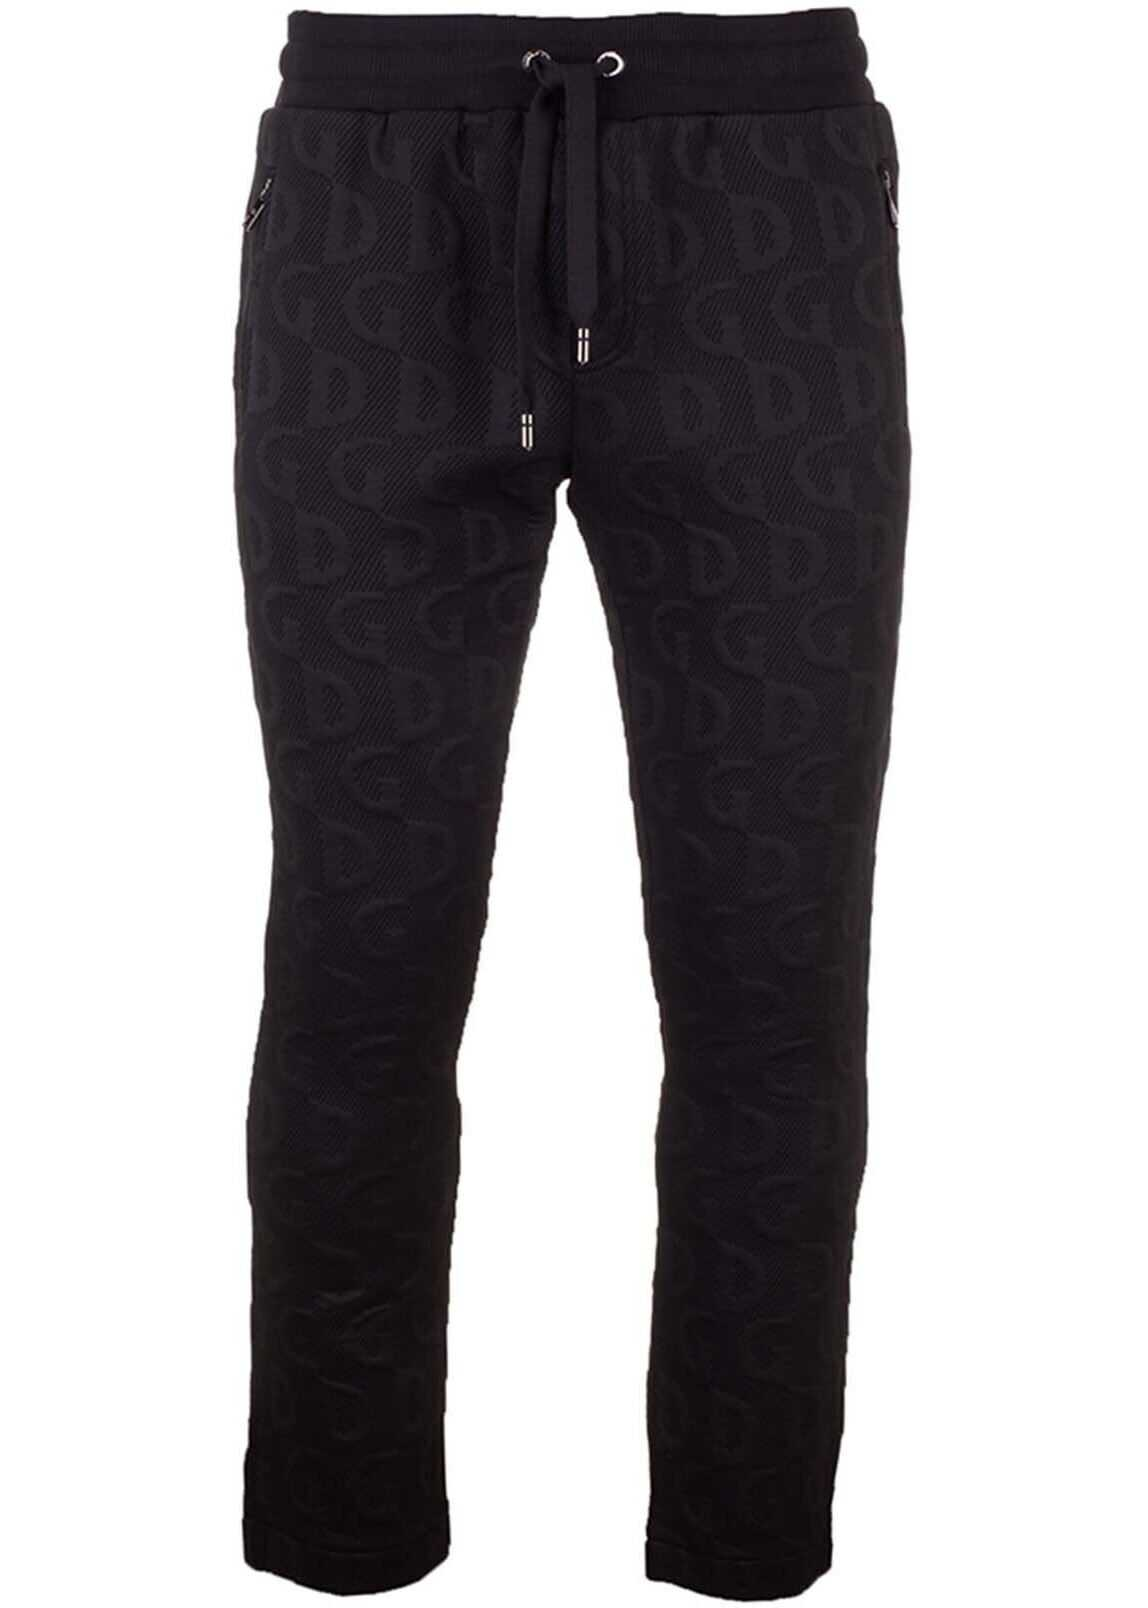 Dolce & Gabbana Monogram Sweat Pants In Black Black imagine